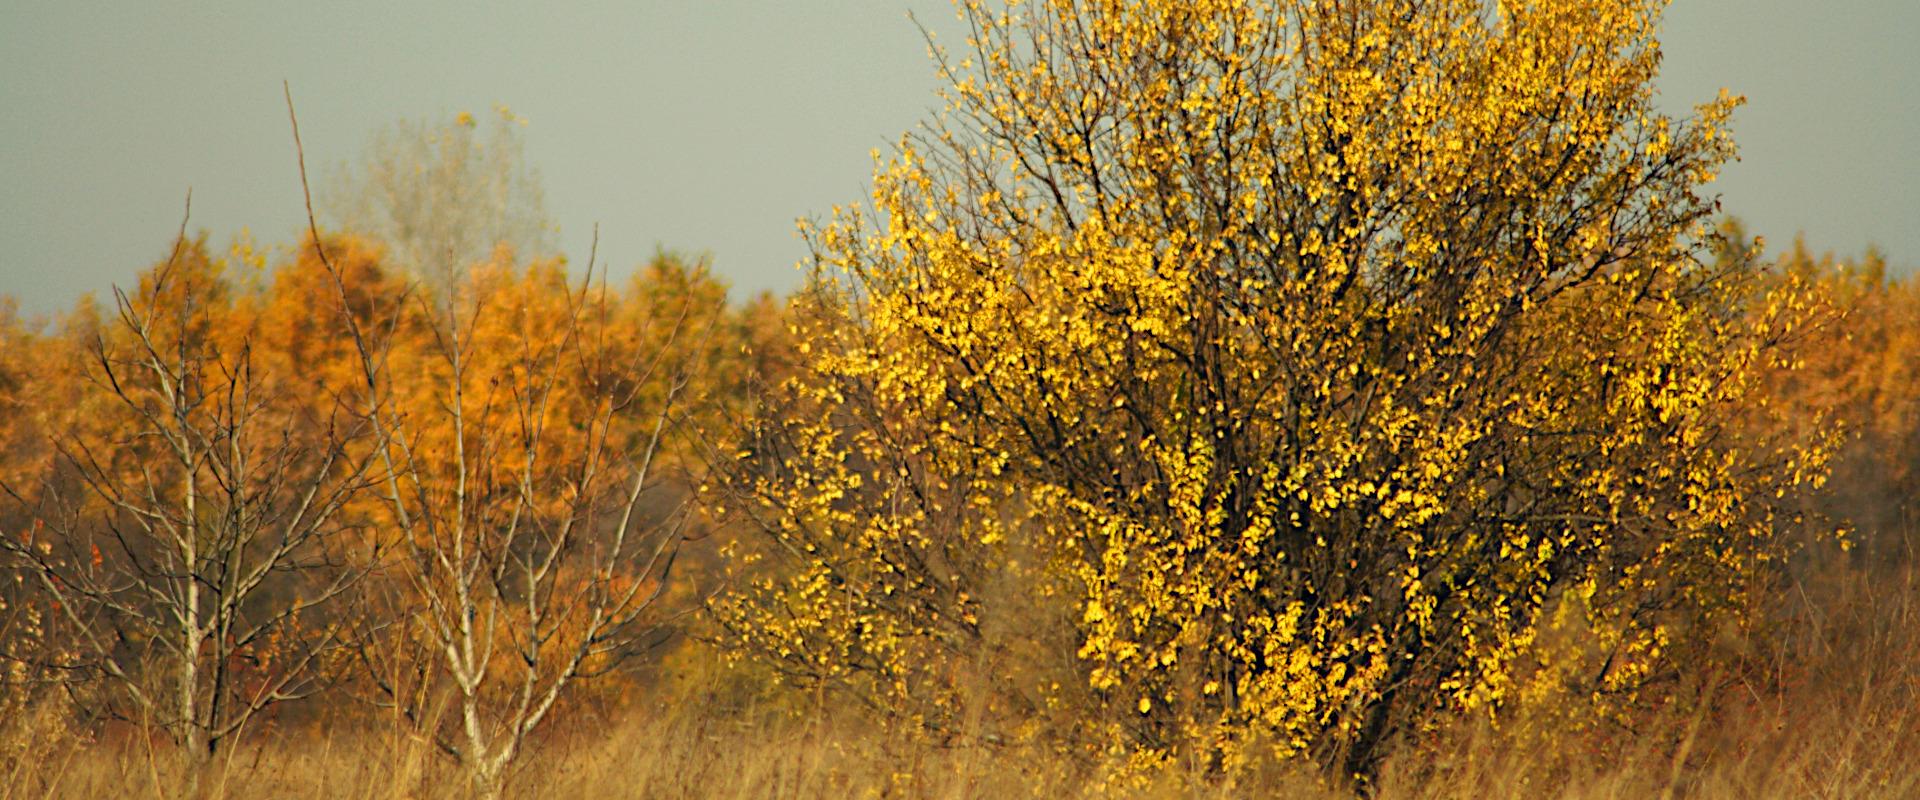 Sweet and bitter autumn memories